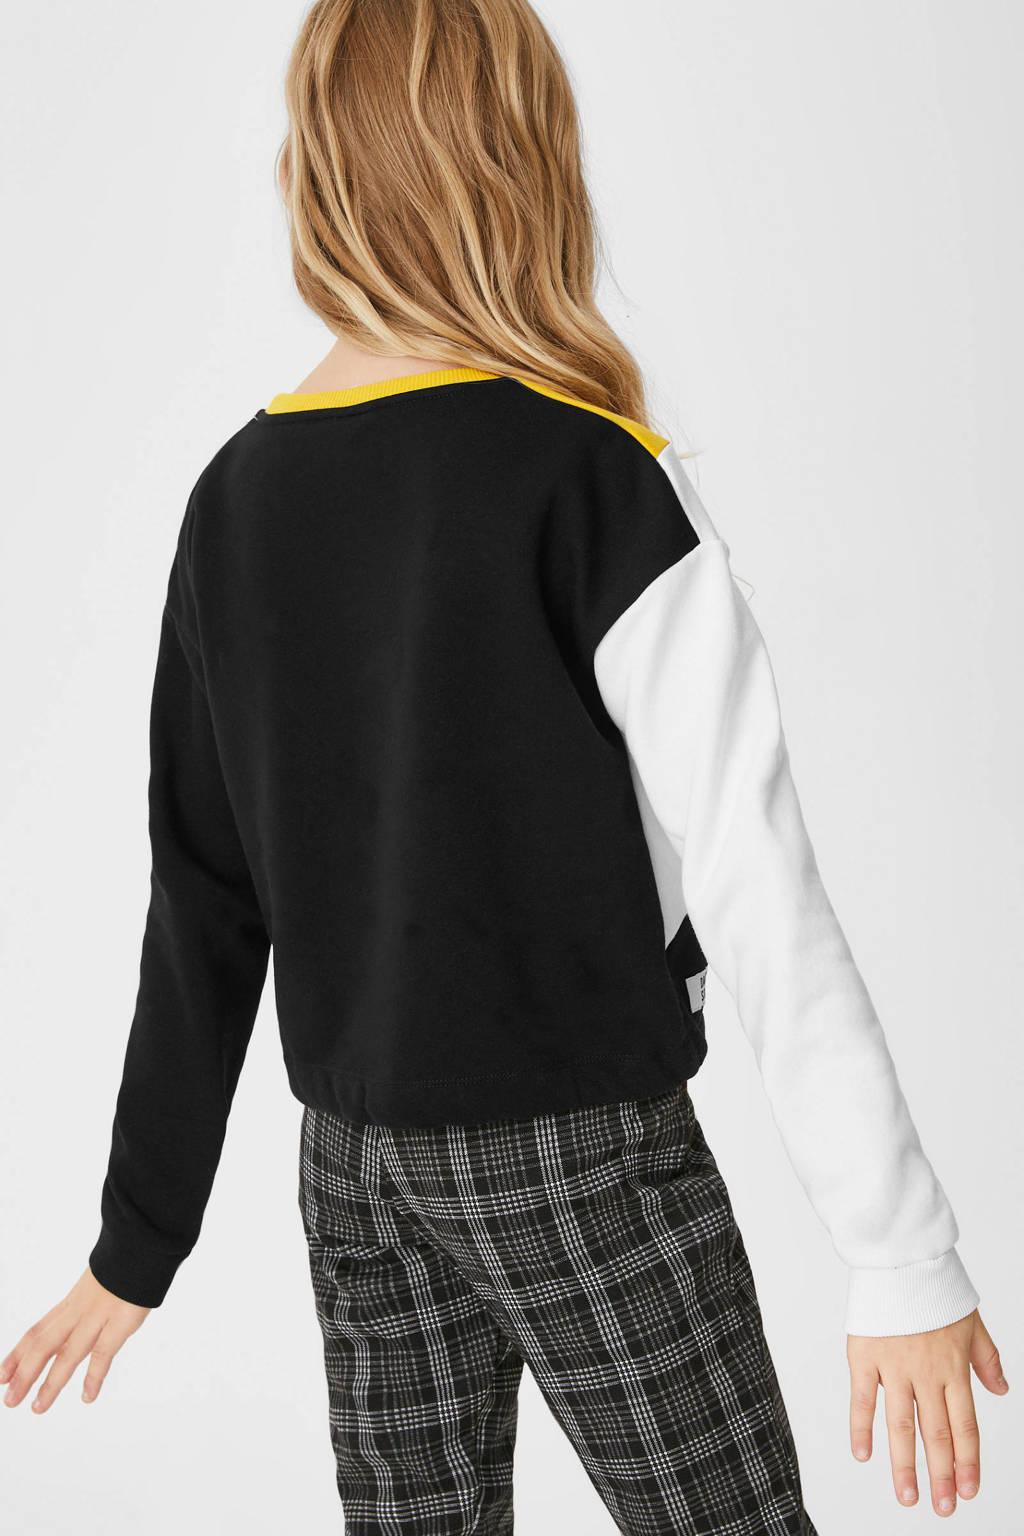 C&A Here & There sweater okergeel/zwart/wit, Okergeel/zwart/wit